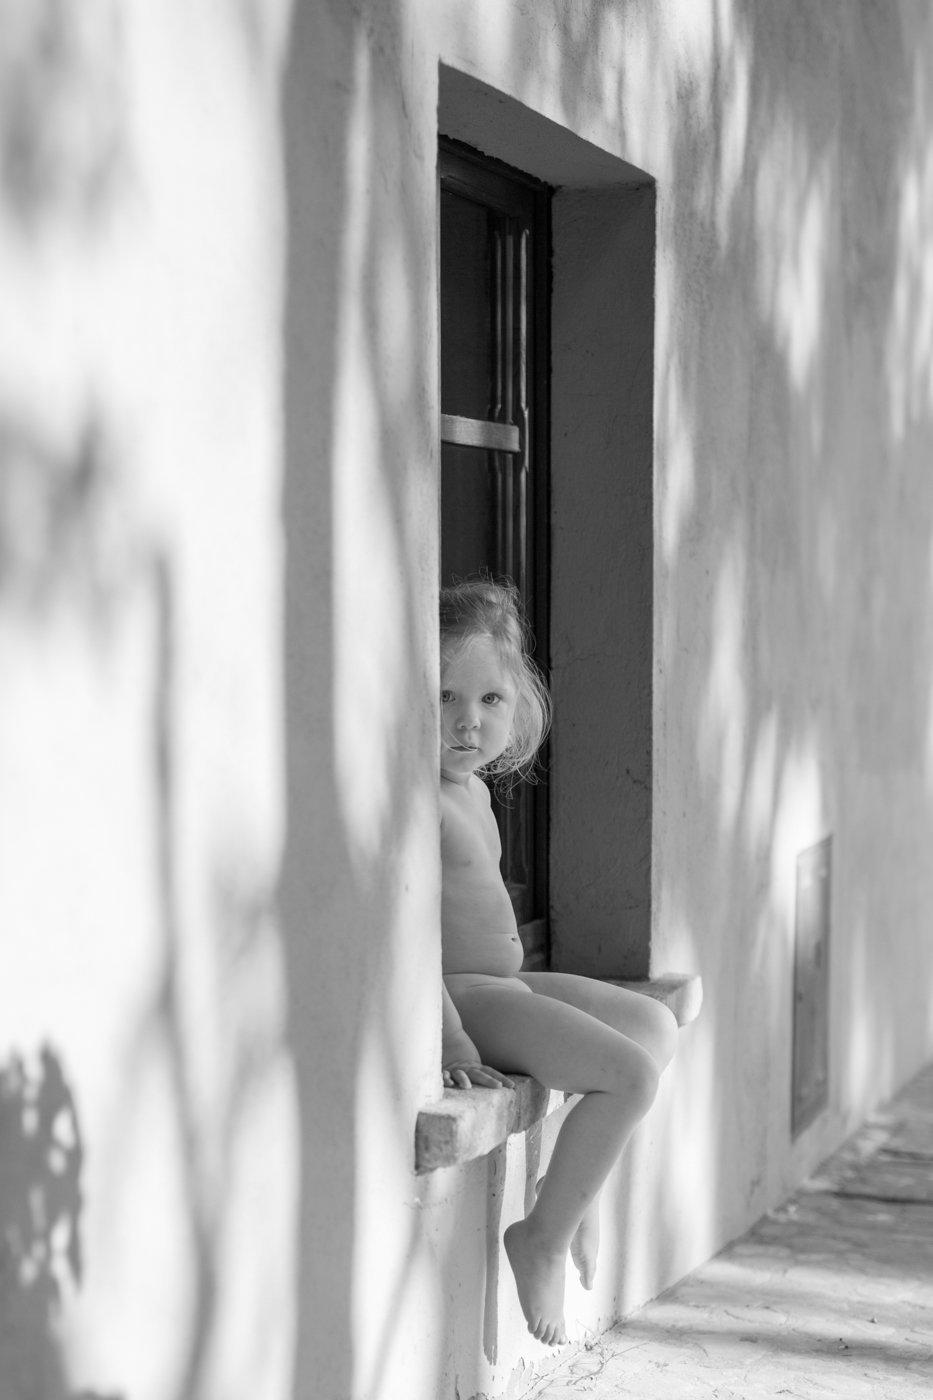 portretfoto jong kind in raam - © Janneke Walter, kinderfotograaf omgeving Utrecht